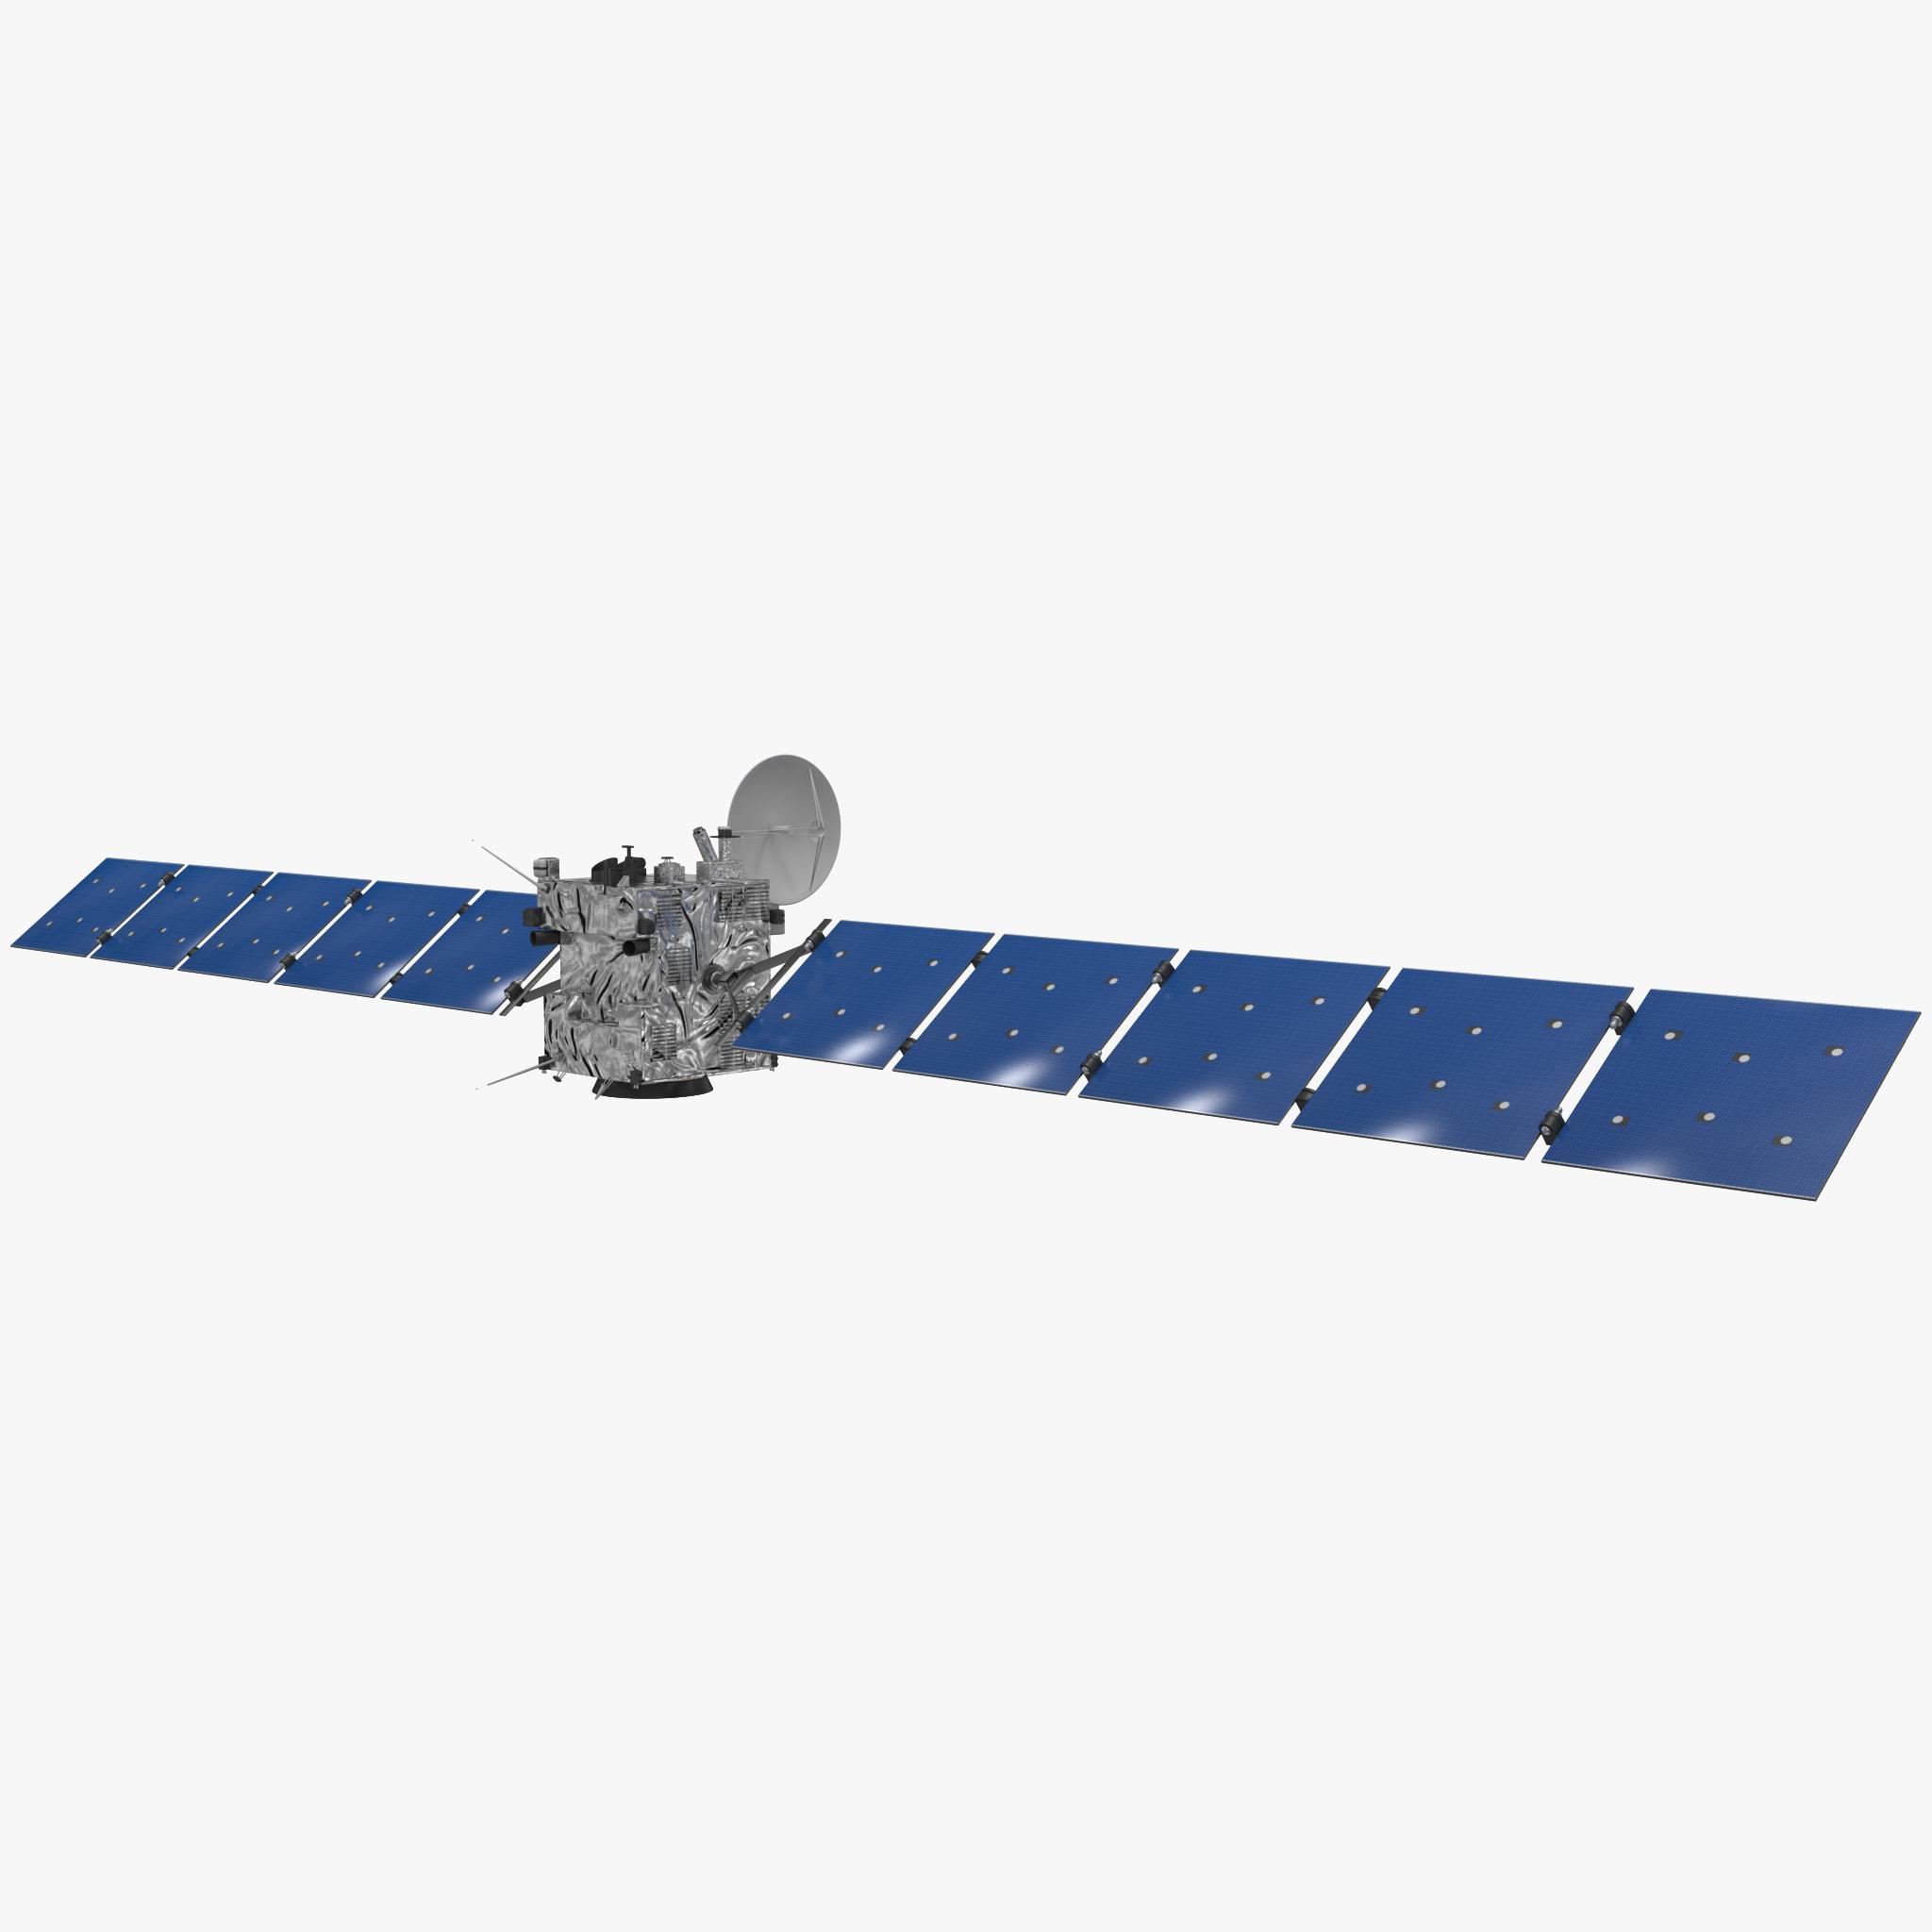 rosetta spacecraft probe 3d model